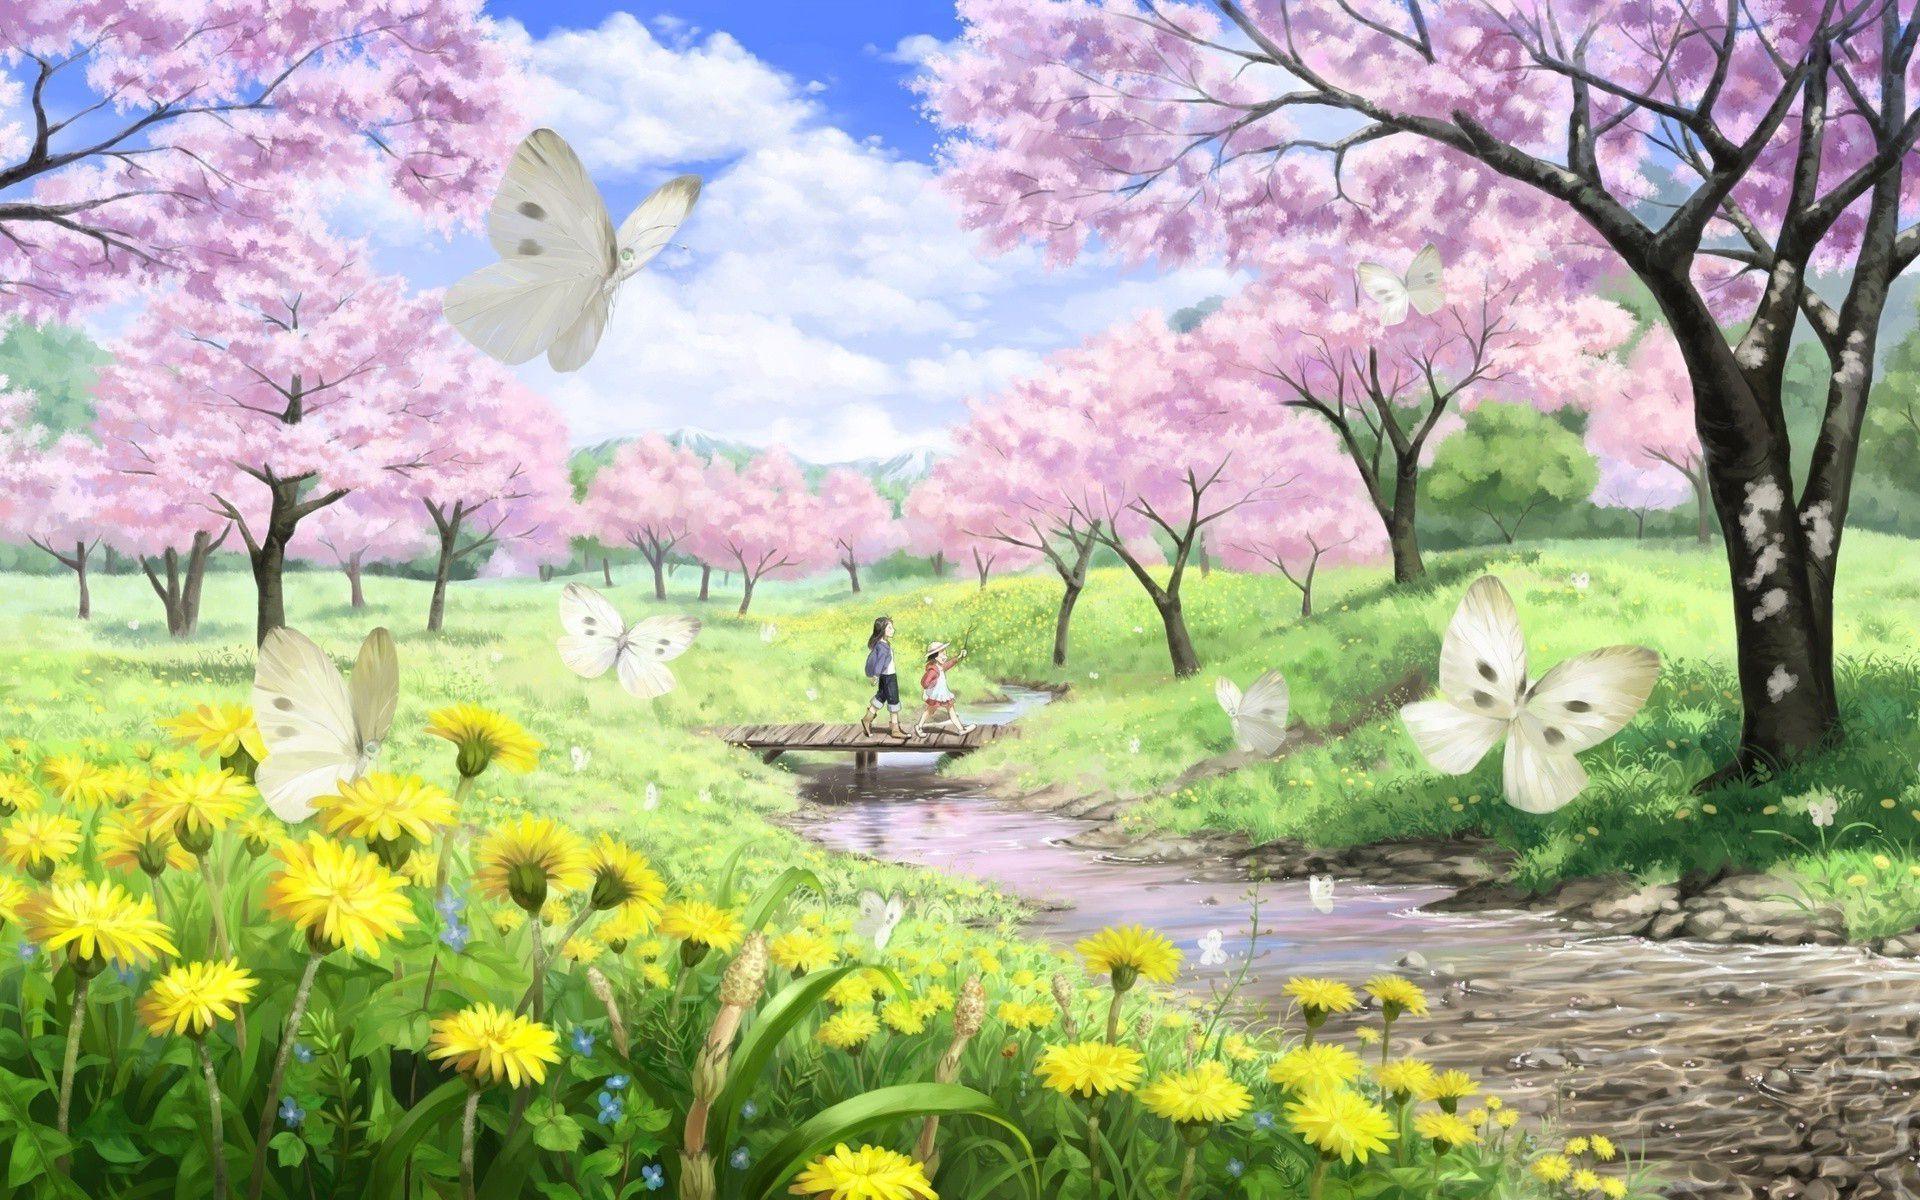 Spring Meadow Hd Desktop Wallpaper High Definition Fullscreen Pemandangan Anime Pemandangan Khayalan Latar Belakang